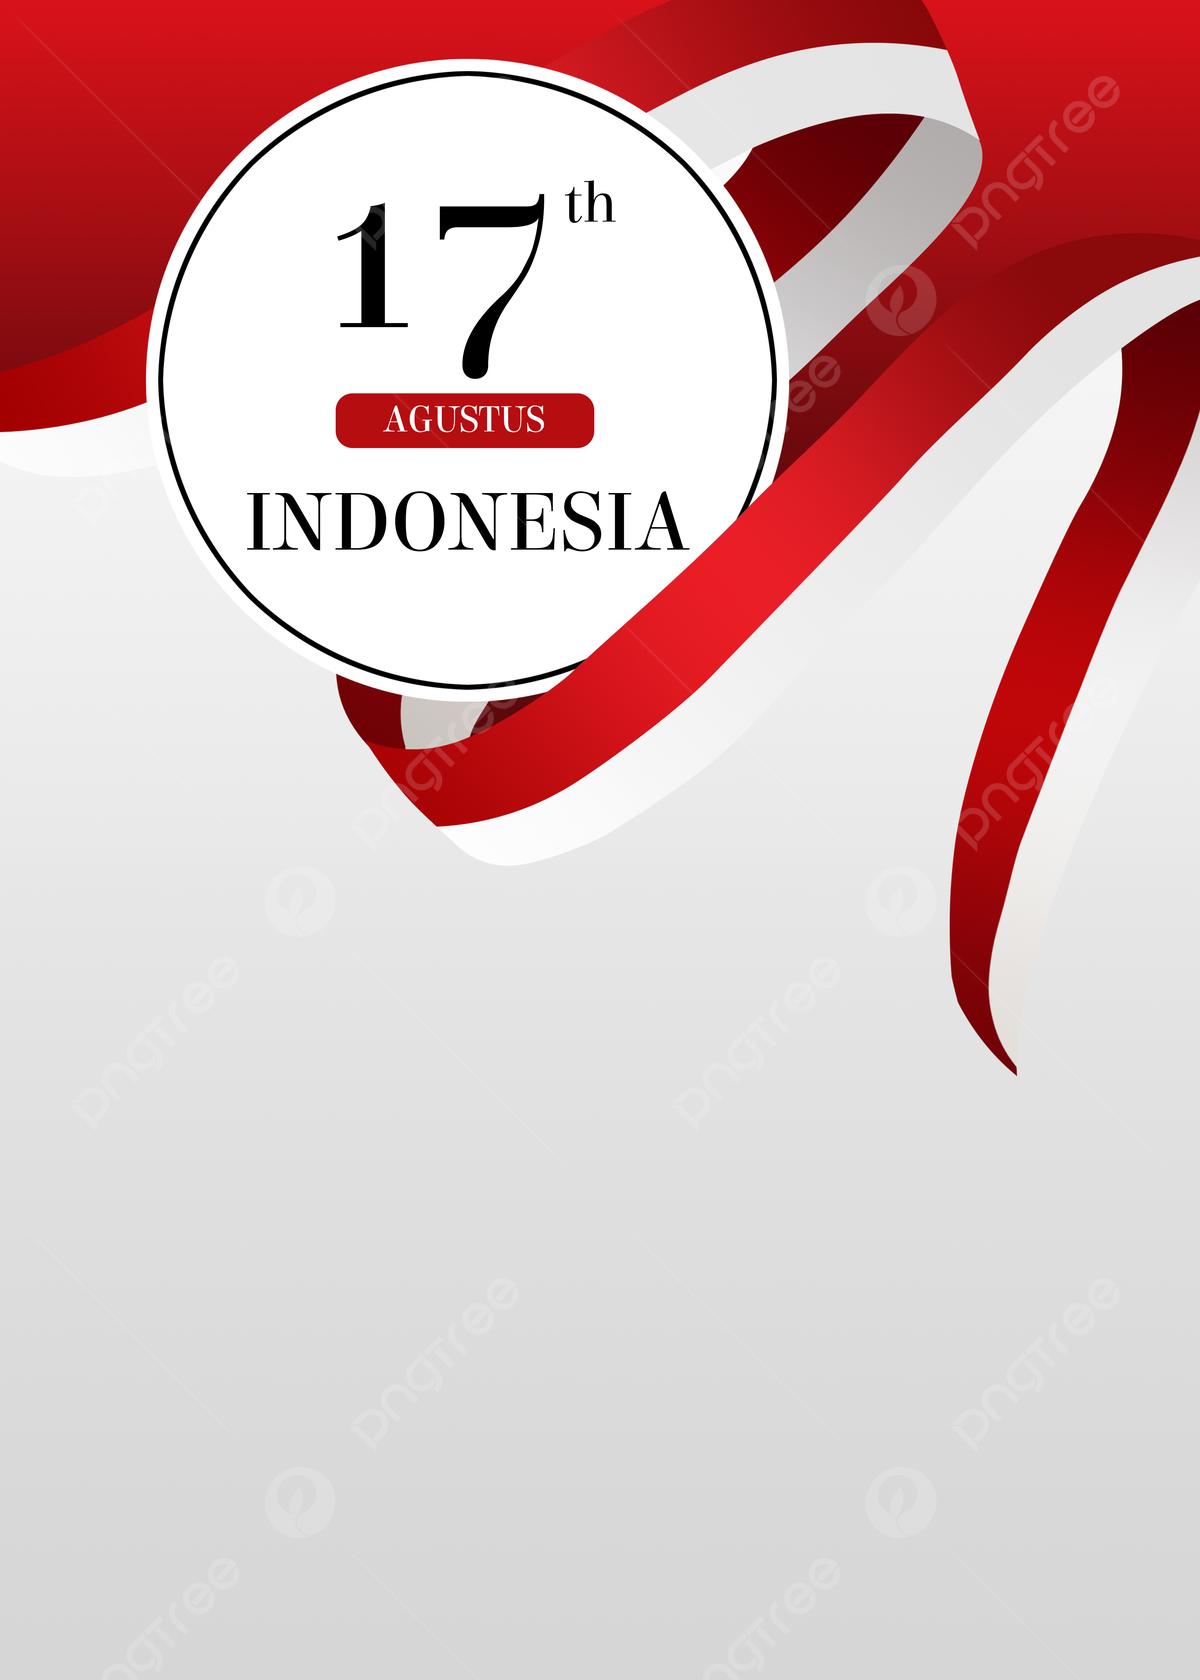 Bendera Indonesia Mewarnai Latar Belakang Hari Pembebasan Indonesia Hari Kemerdekaan Hari Pembebasan Gambar Latar Belakang Untuk Unduhan Gratis